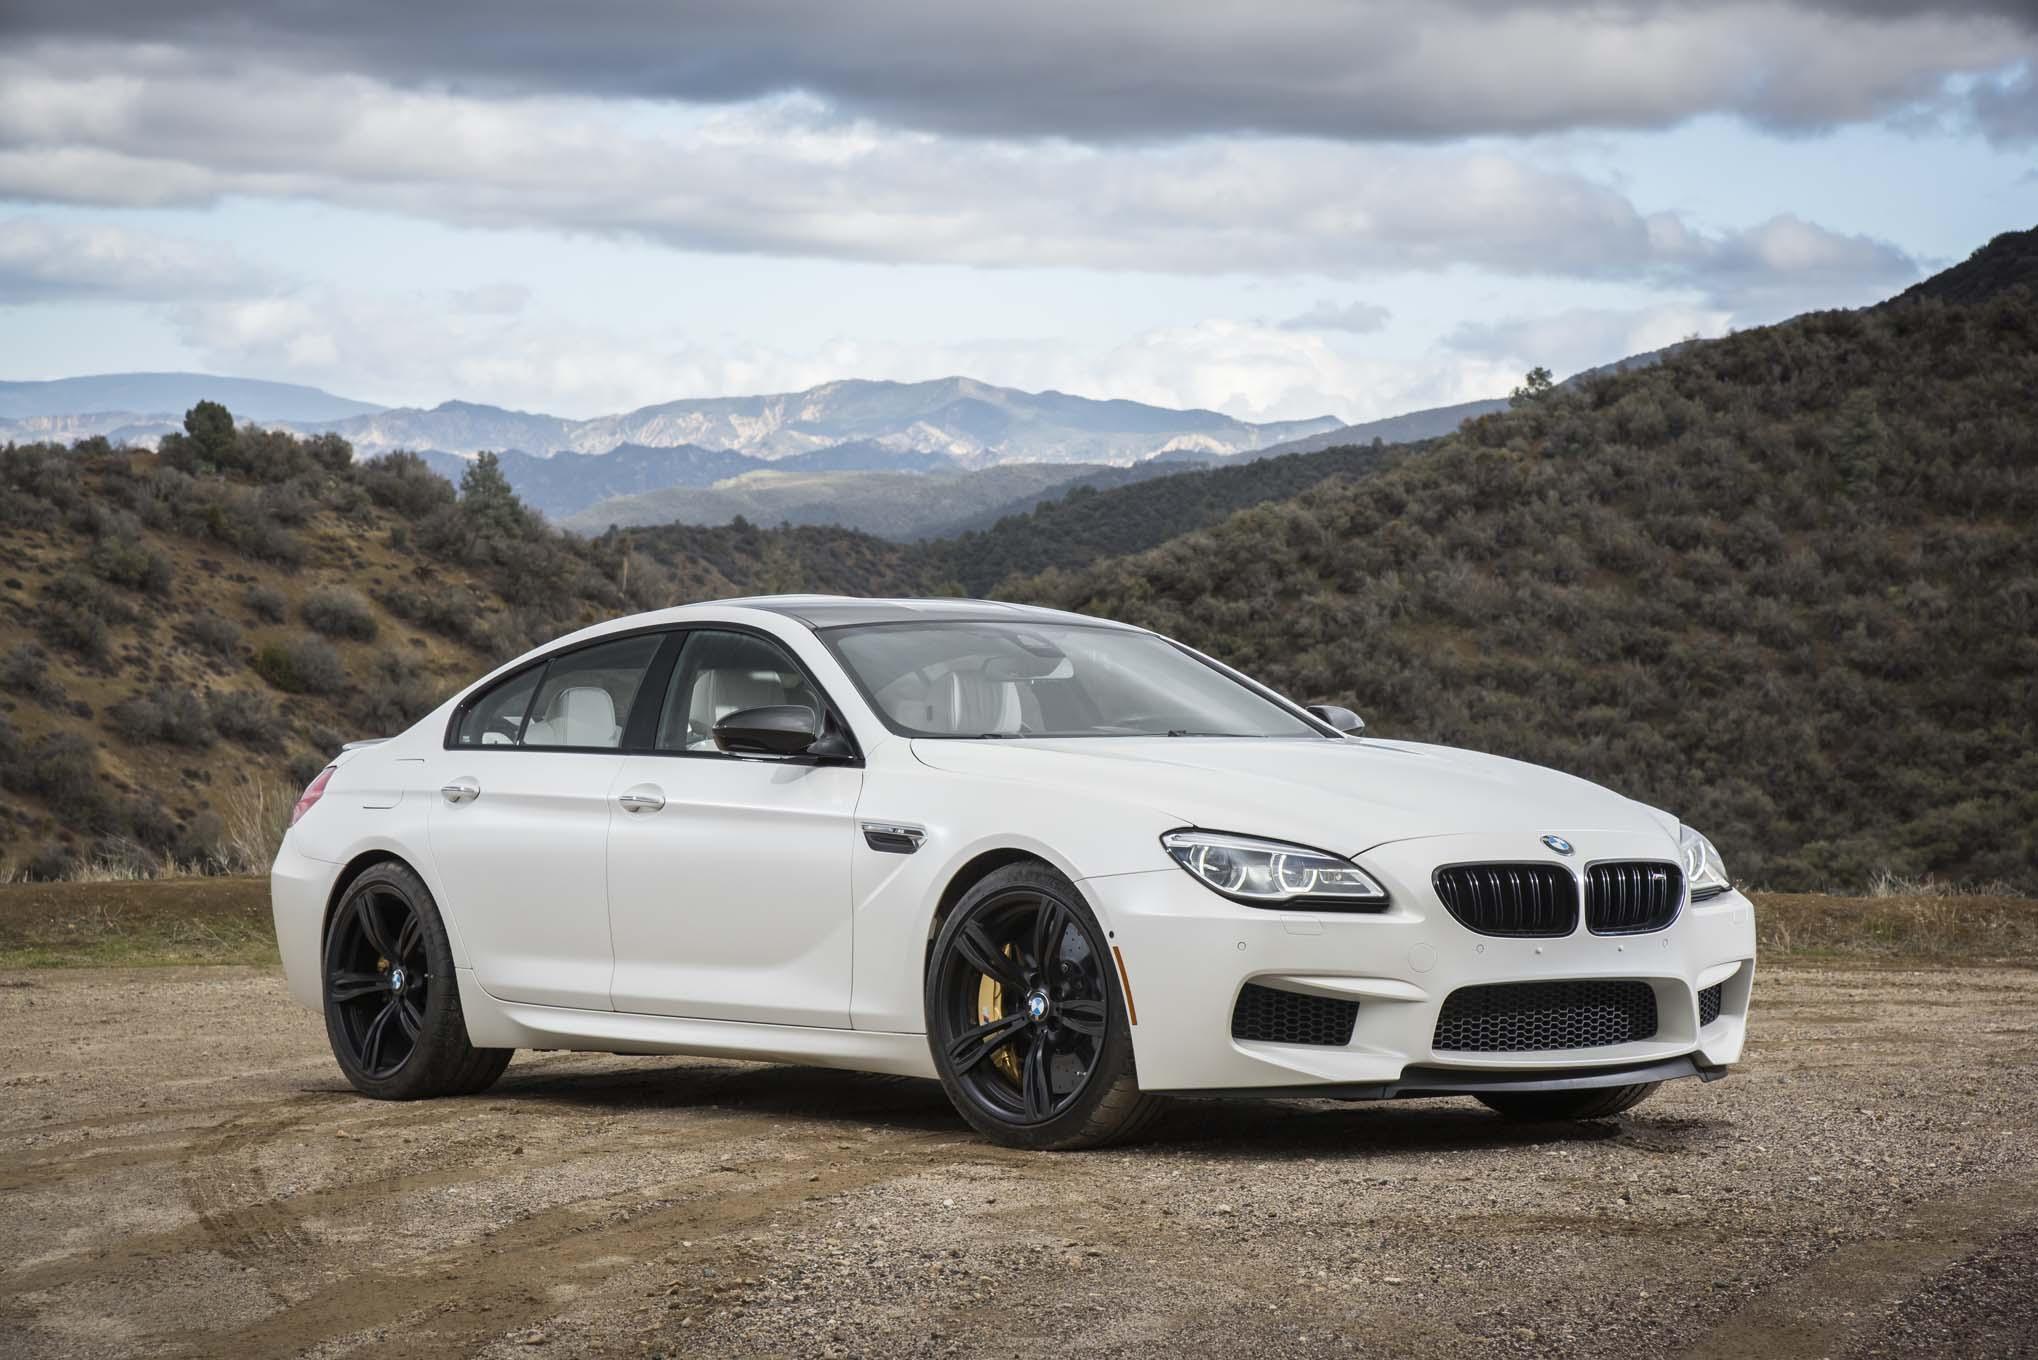 2017 BMW M6 Gran Coupe front three quarter